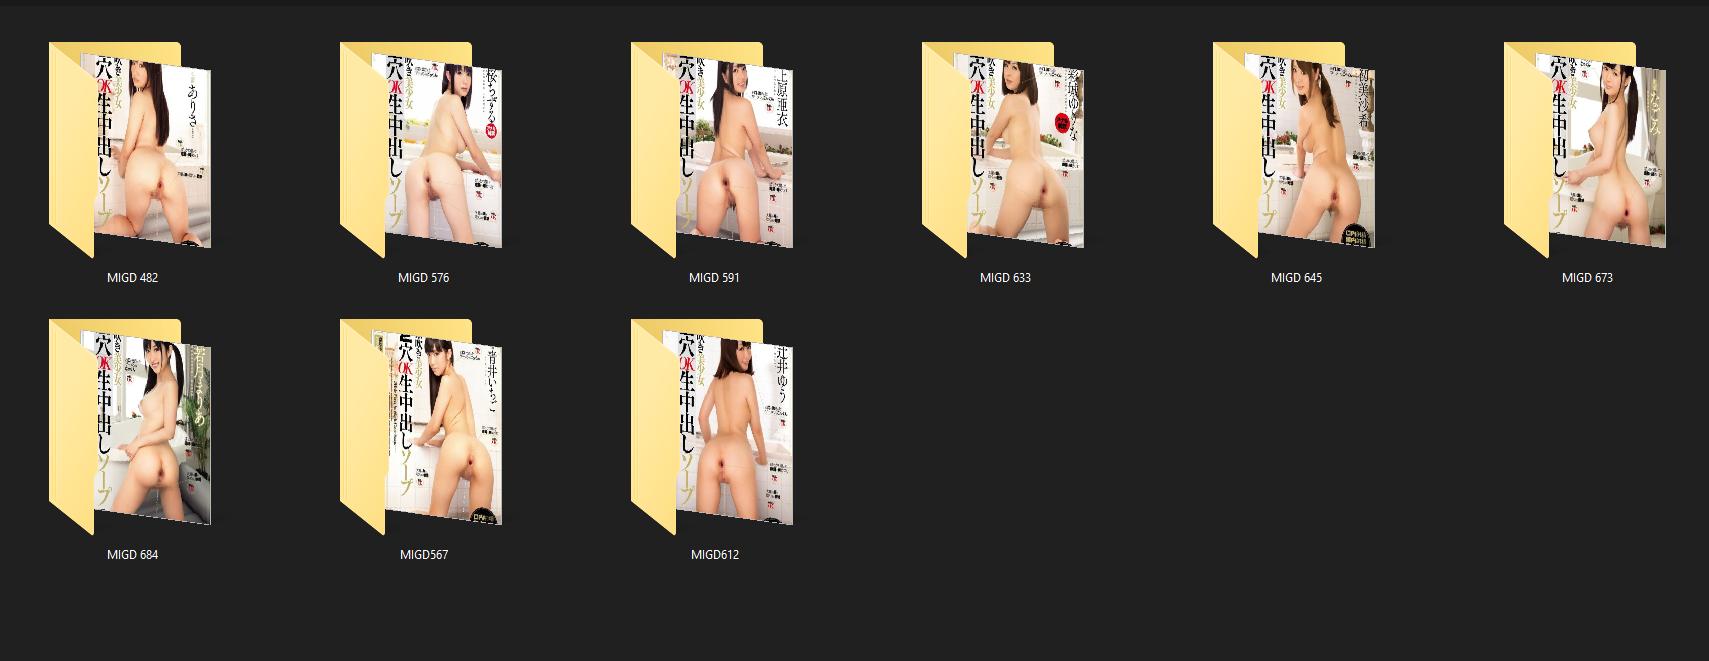 Folder View.png